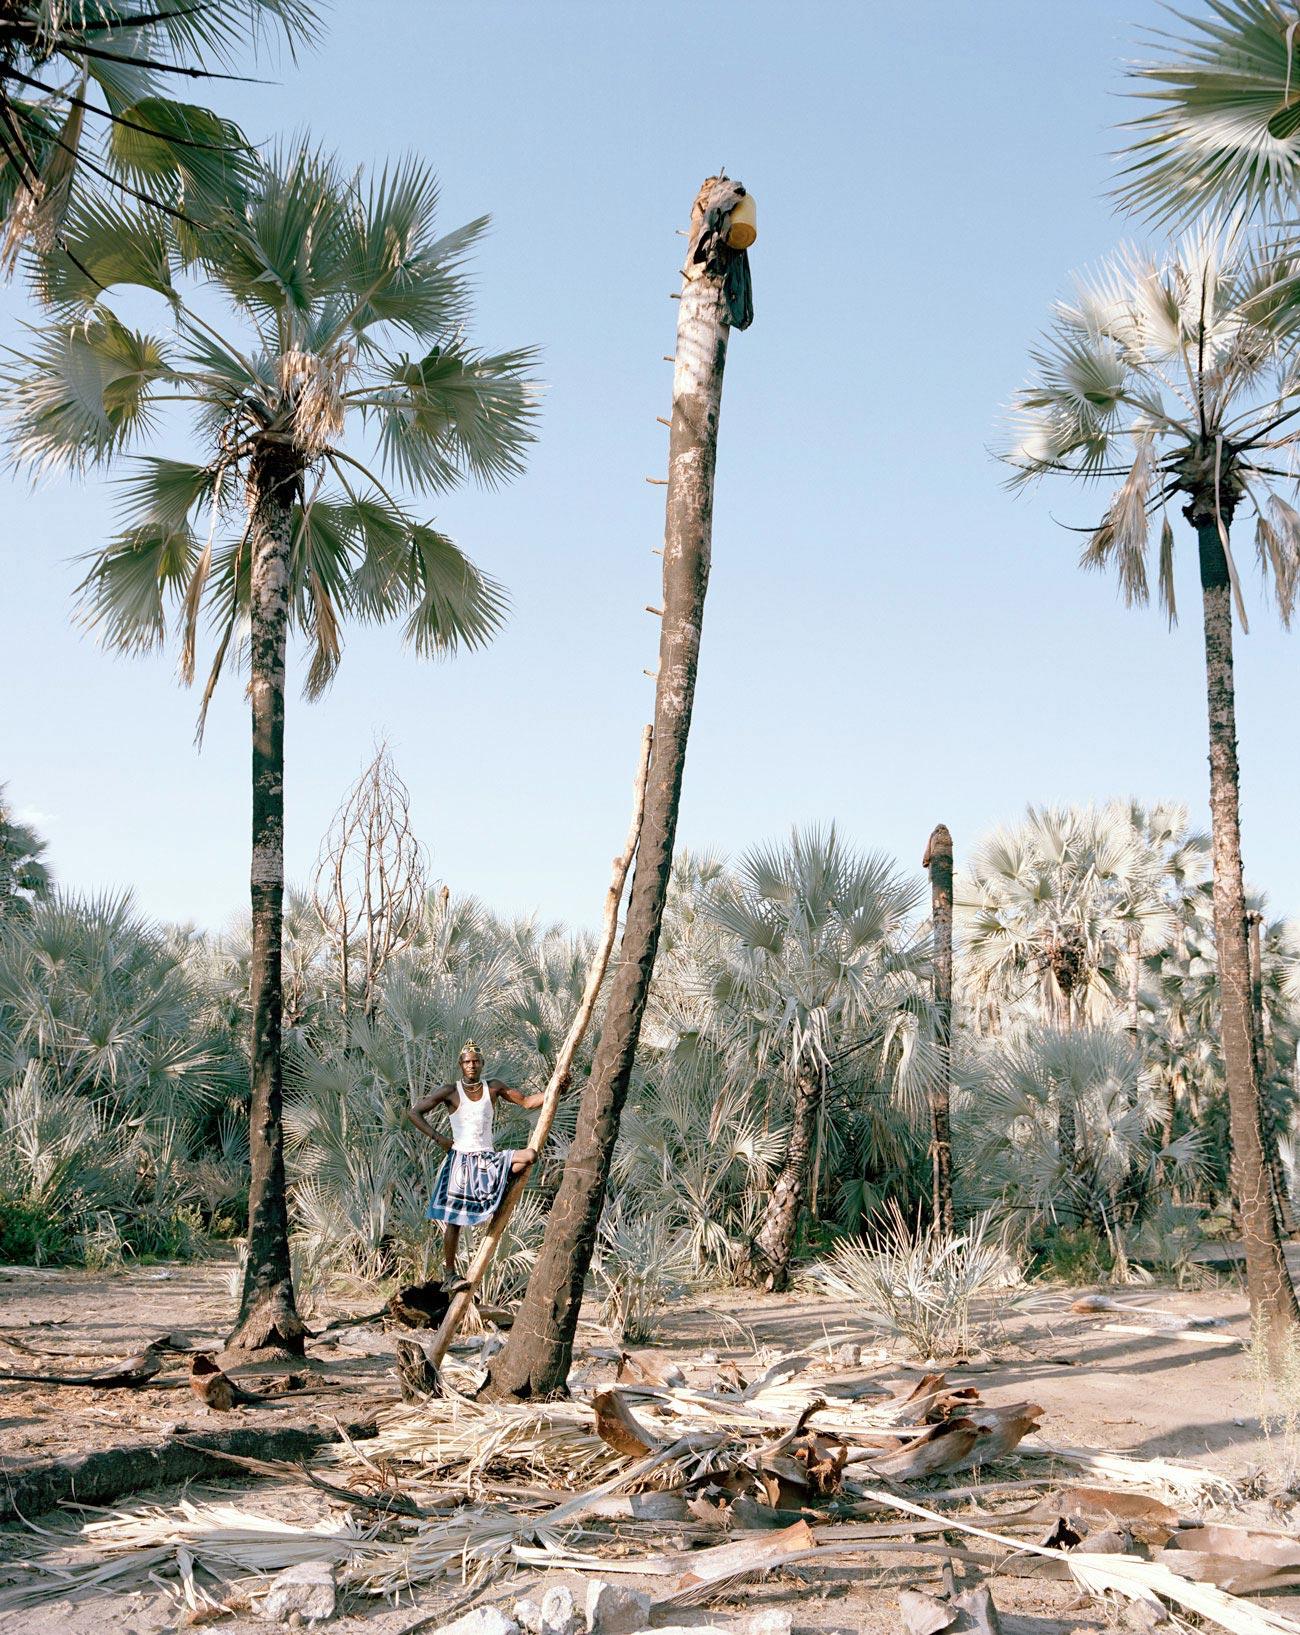 palm-wine-collectors-kyle-weeks-4